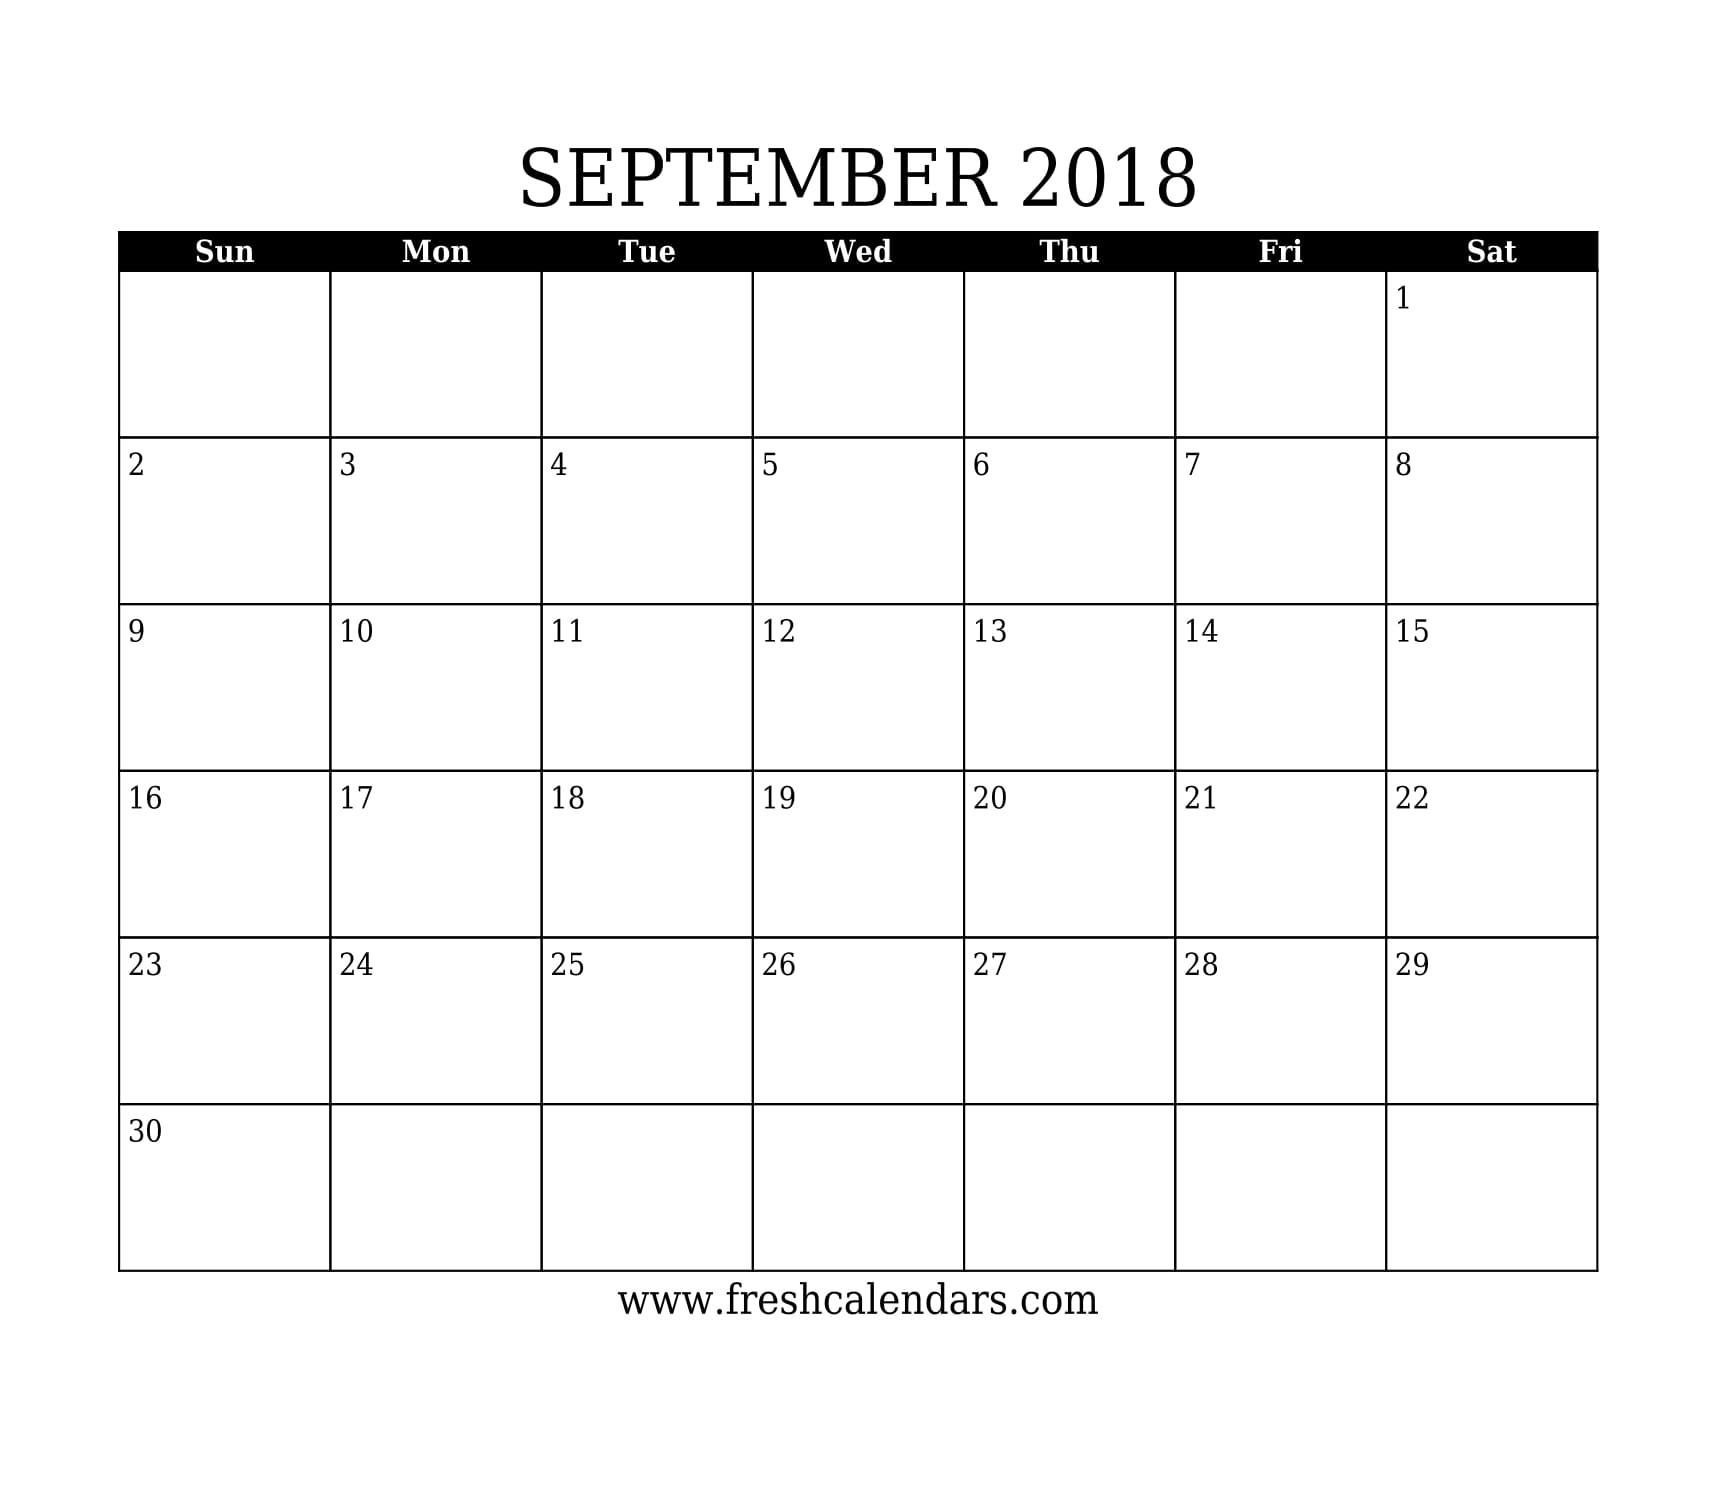 September 2018 Calendar Printable - Fresh Calendars within Blank Calendars Printable September